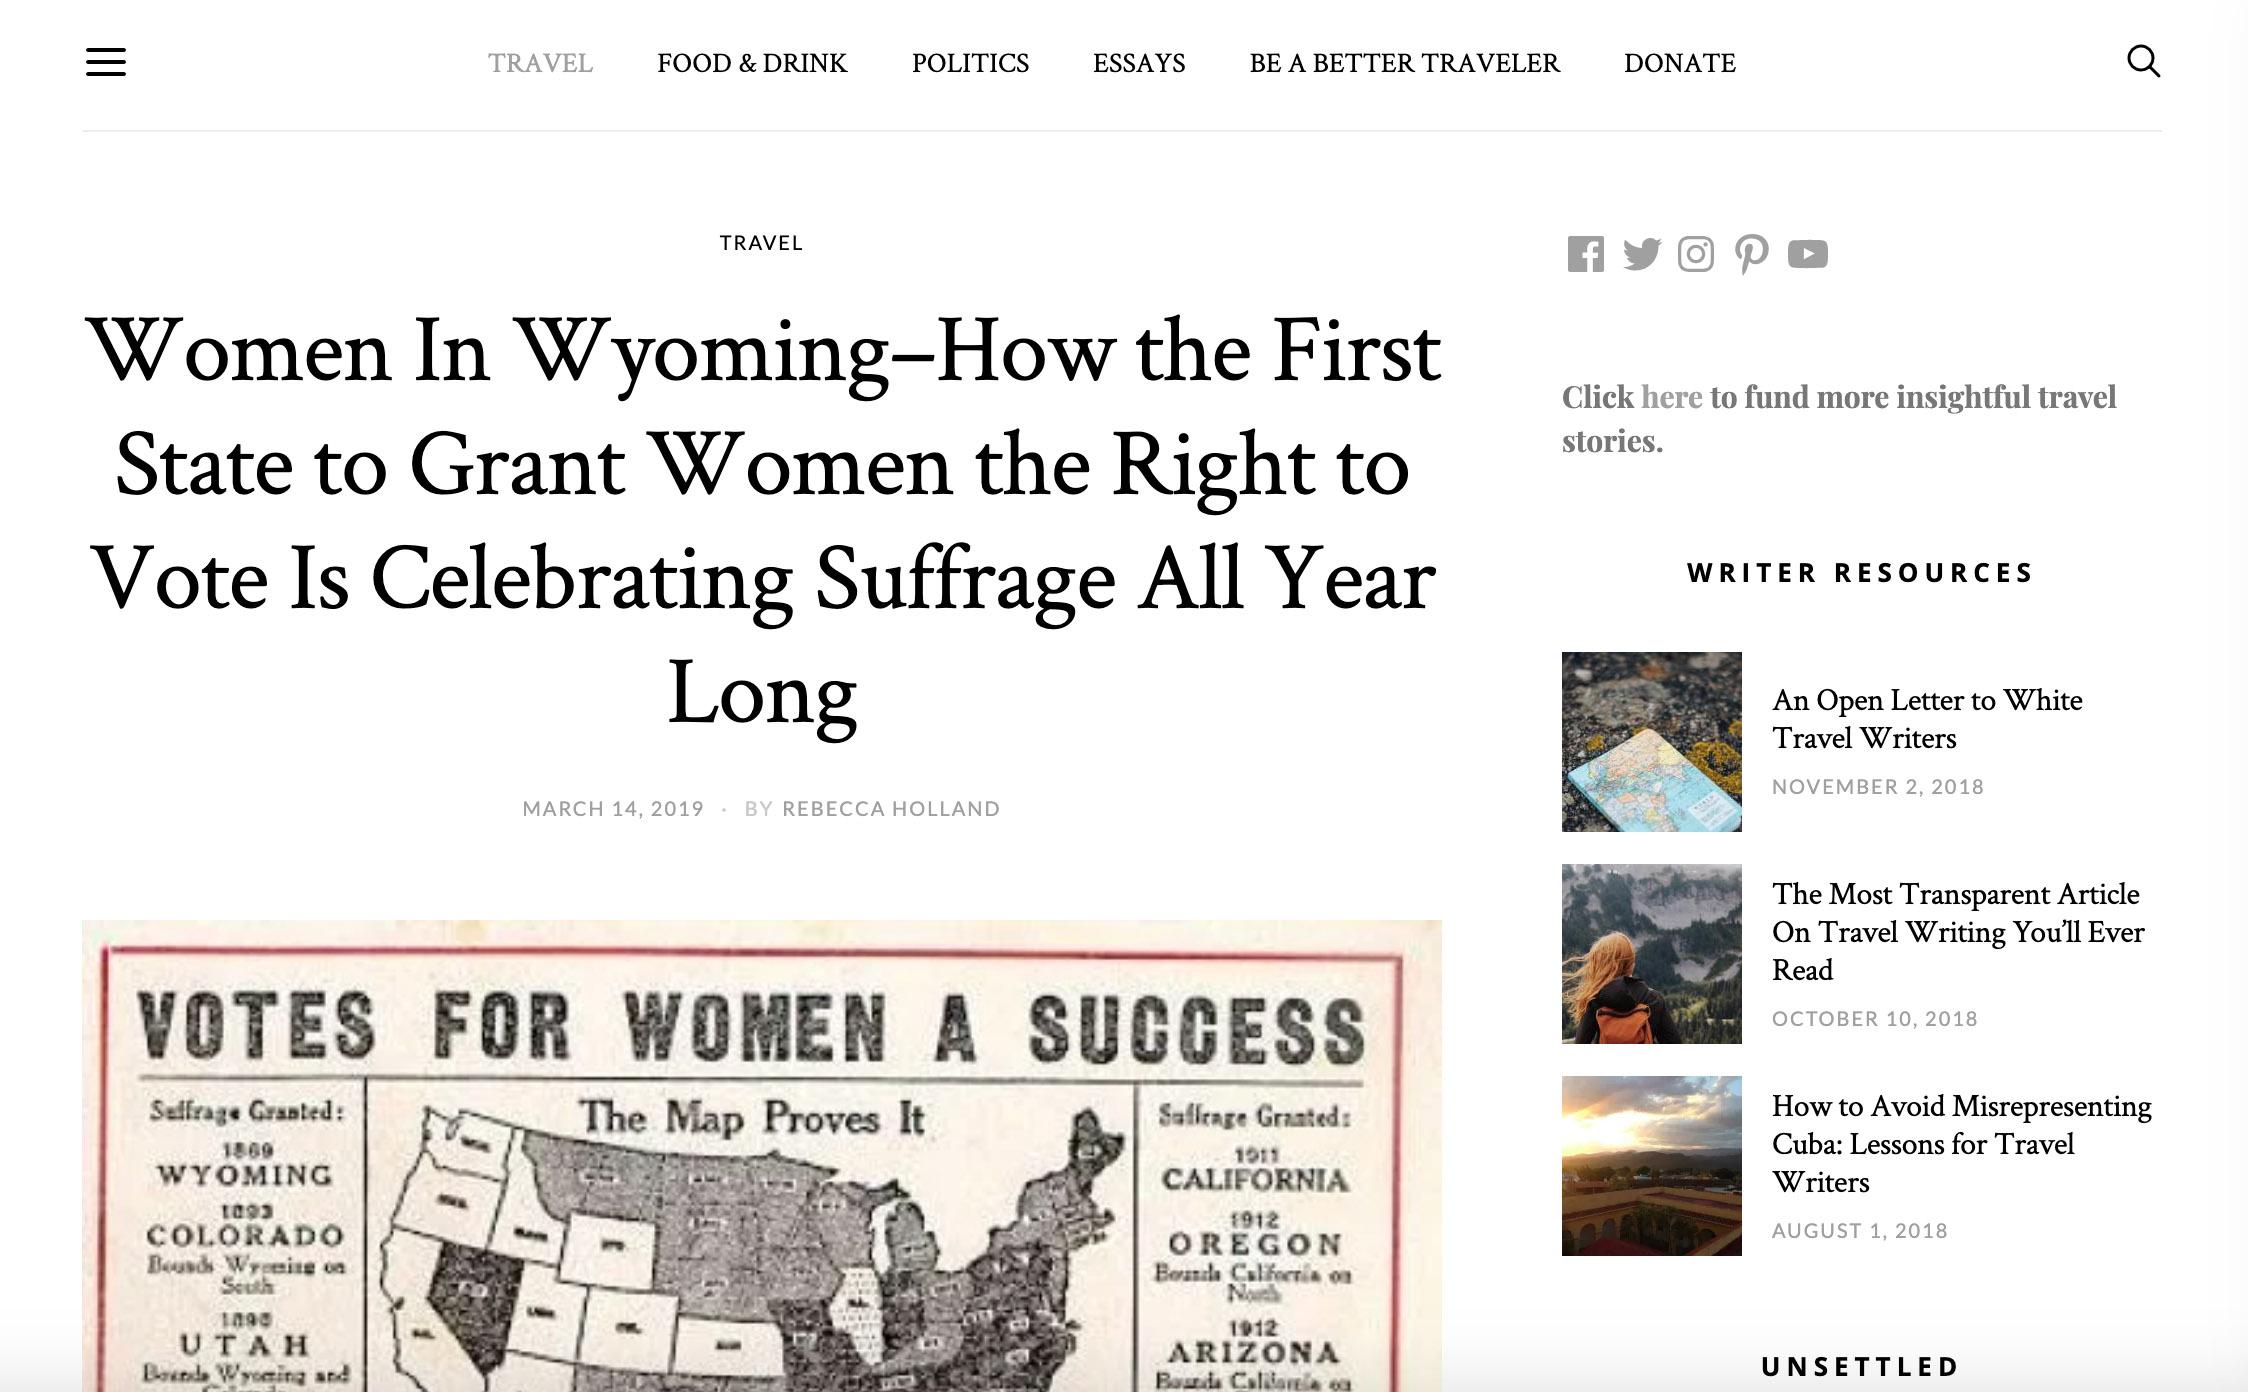 Women_in_Wyoming_Press_CuriosityMag.jpg